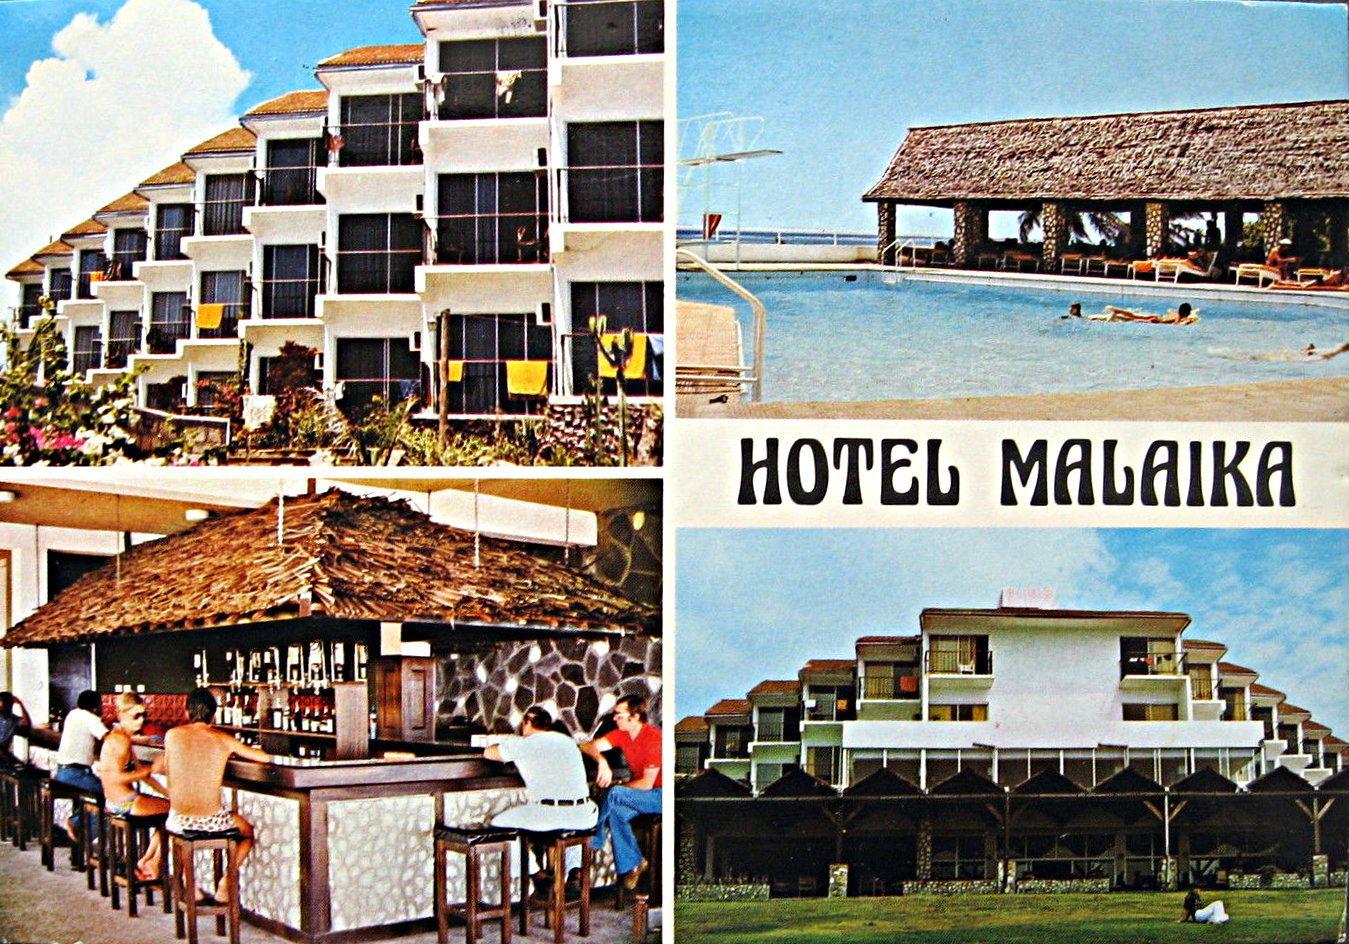 Hotel Malaika Mombasa Kenya 1970s Mombasa Kenya Special Places Out Of Africa